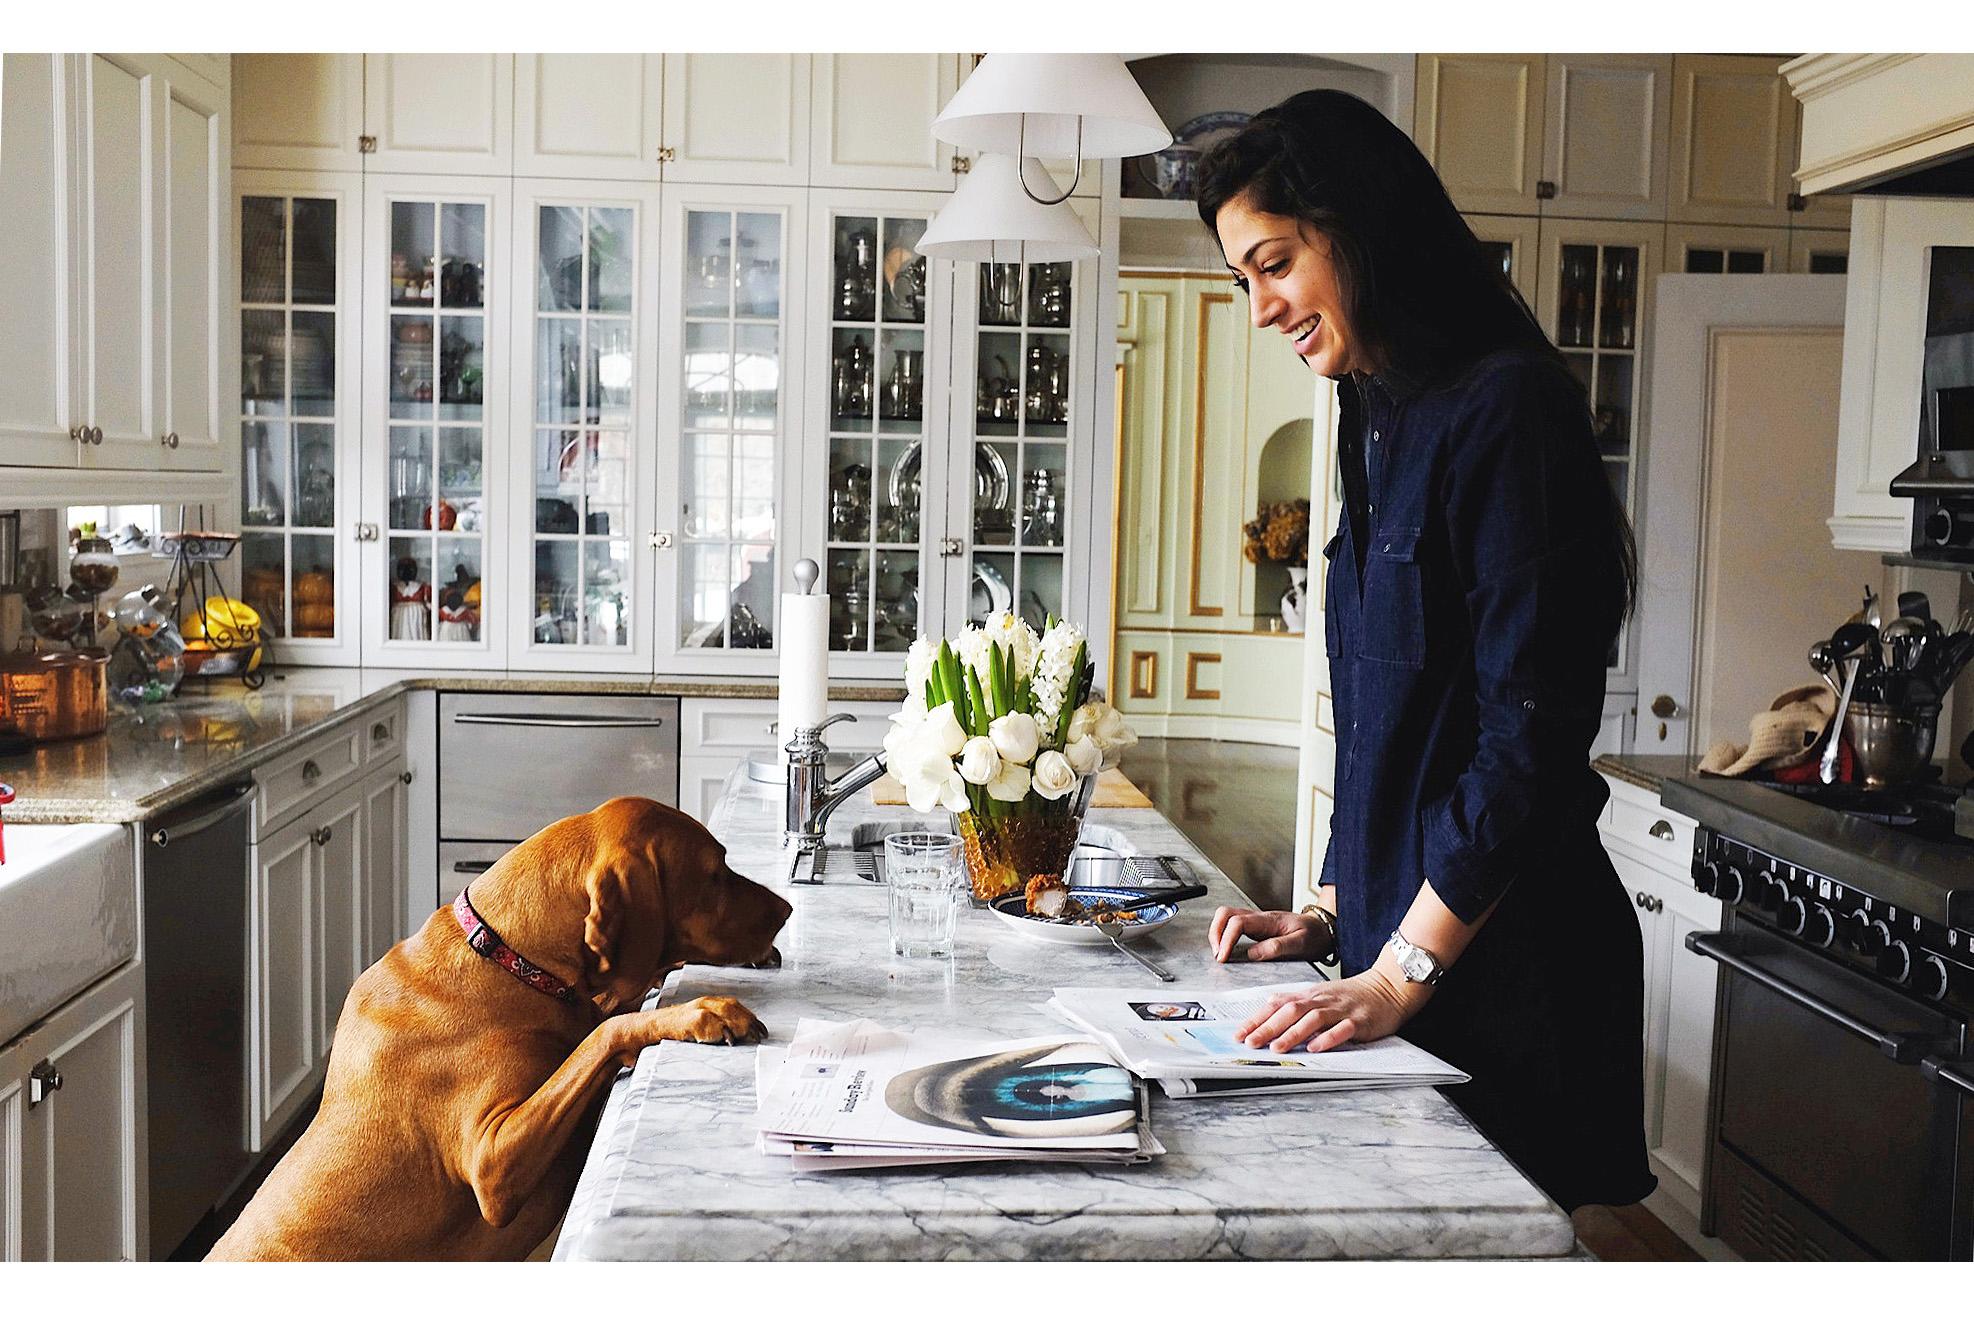 Chefanie at home. Photo credit:  Agnes Fischer